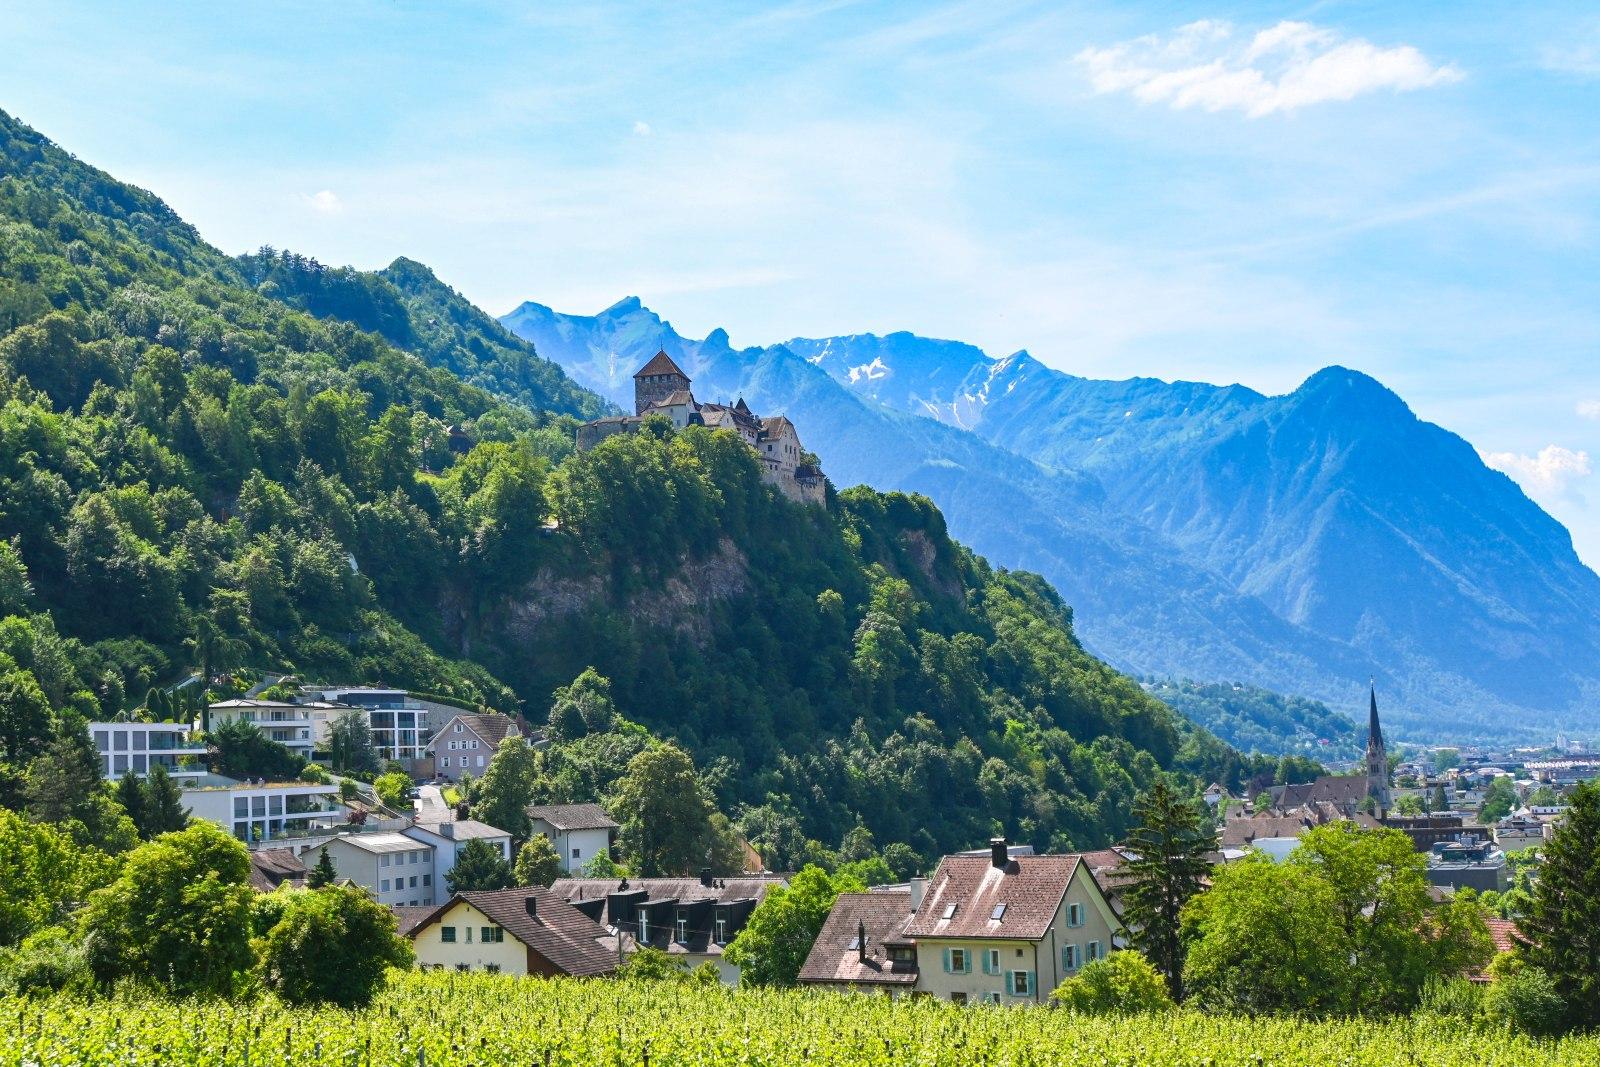 Výhled na hrad ve Vaduzu